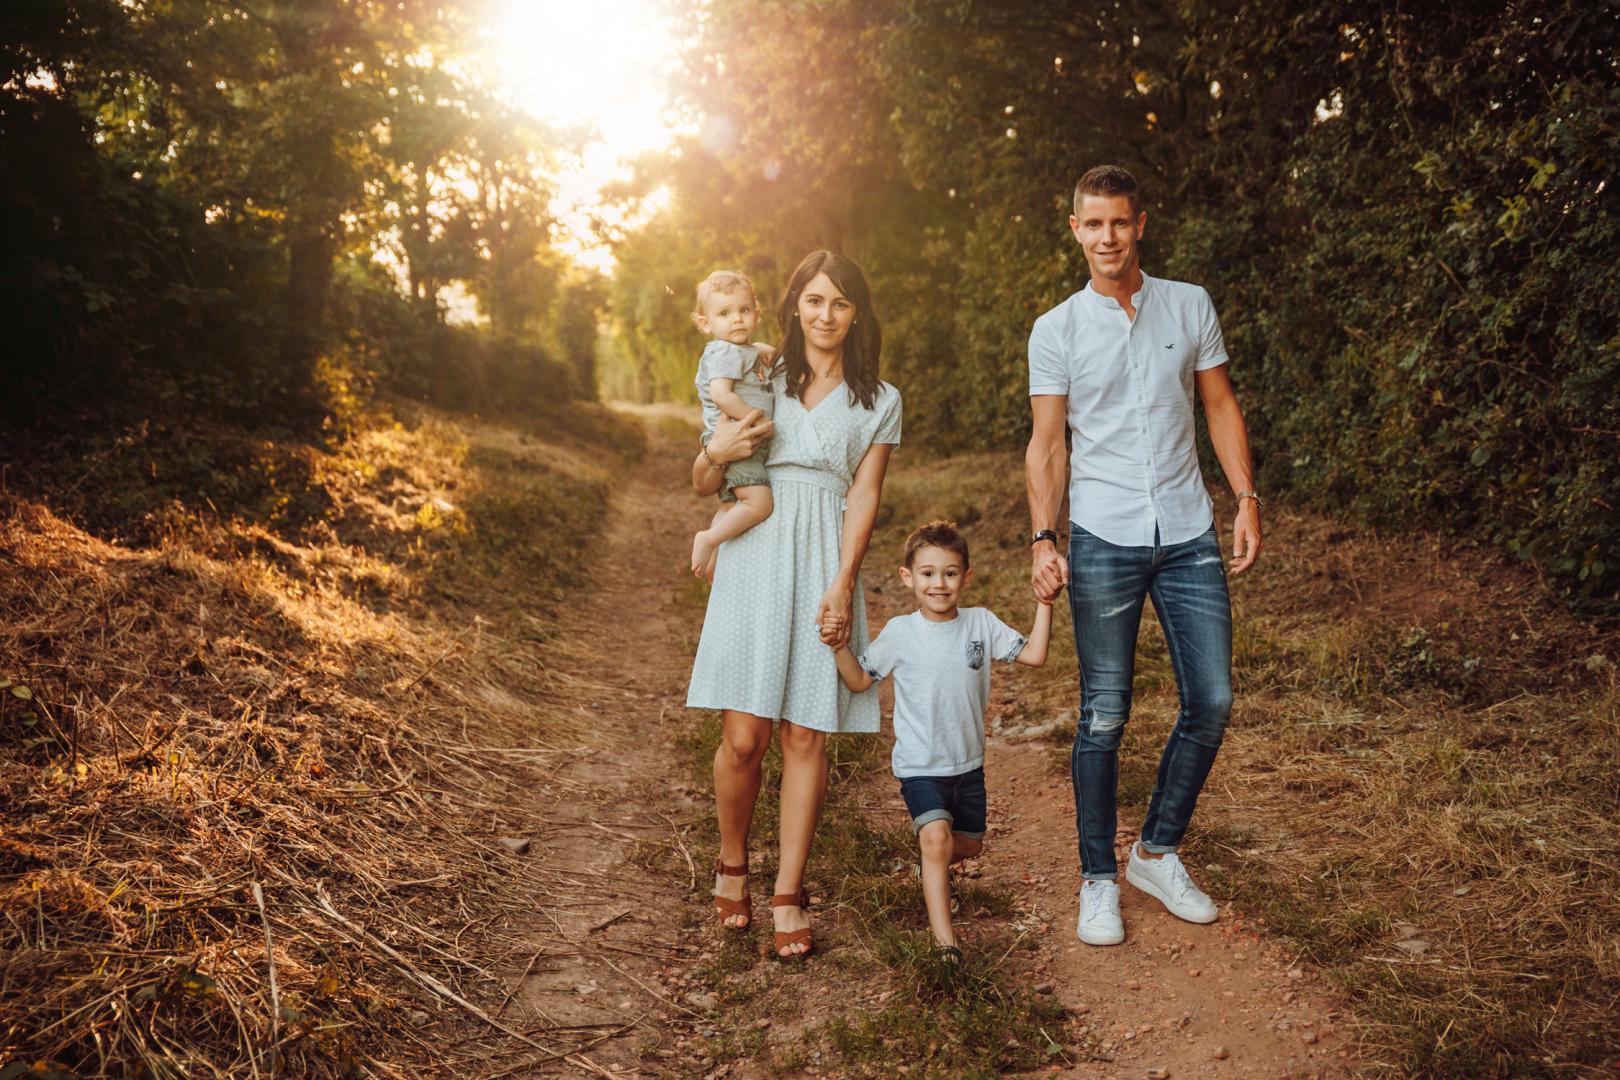 Photographe Famille 68 - Photographe Famille Alsace - Photographe Famille Mulhouse - Photographe Famille – Photographe Mulhouse Bertrand DISDIER